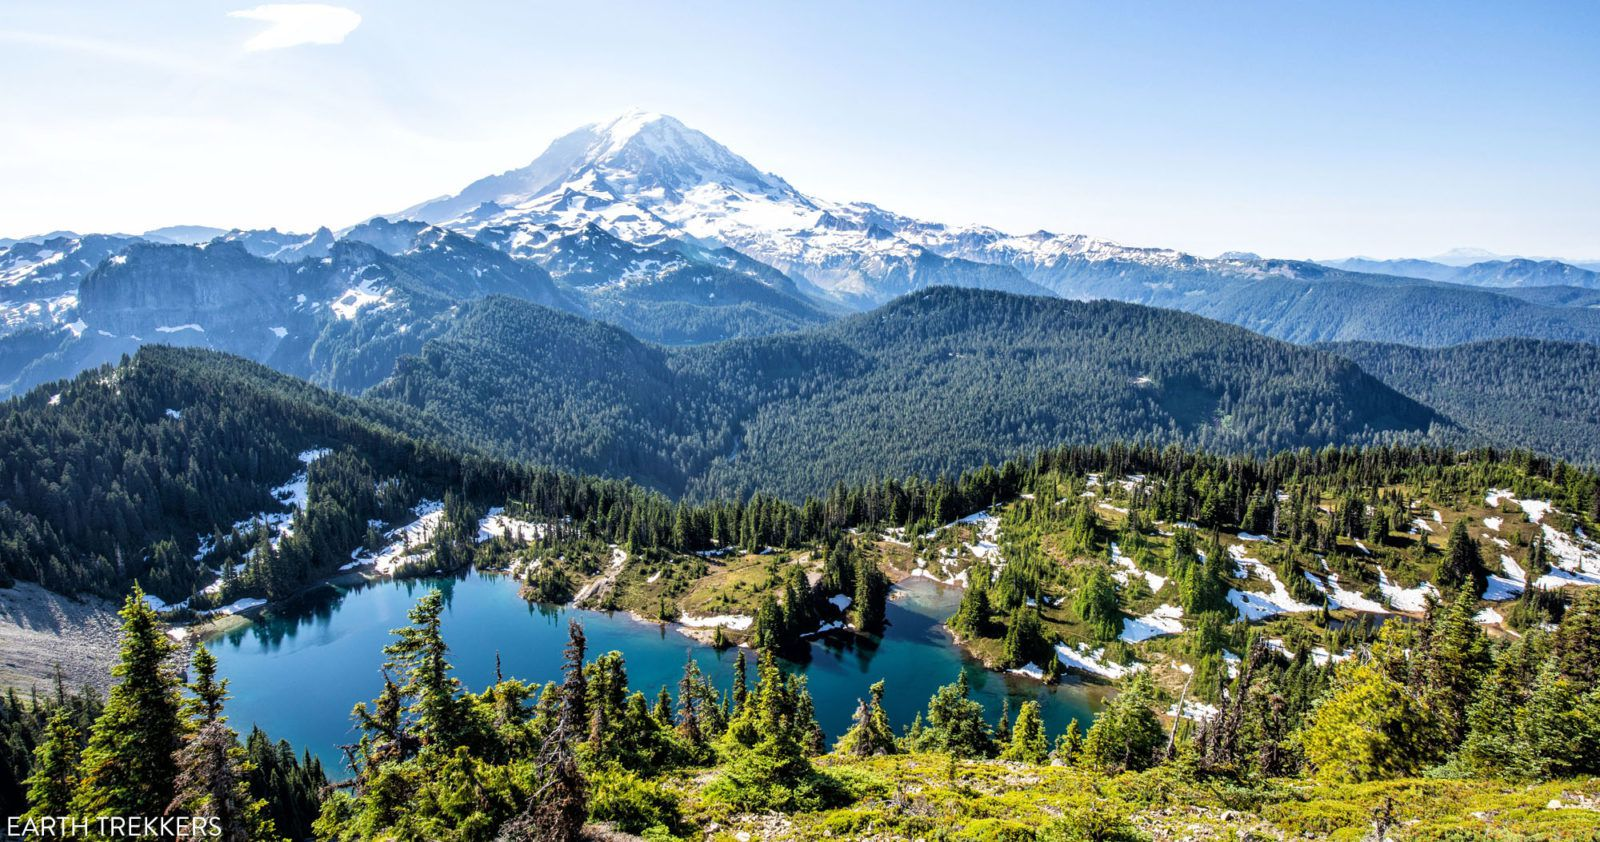 Tolmie Peak View